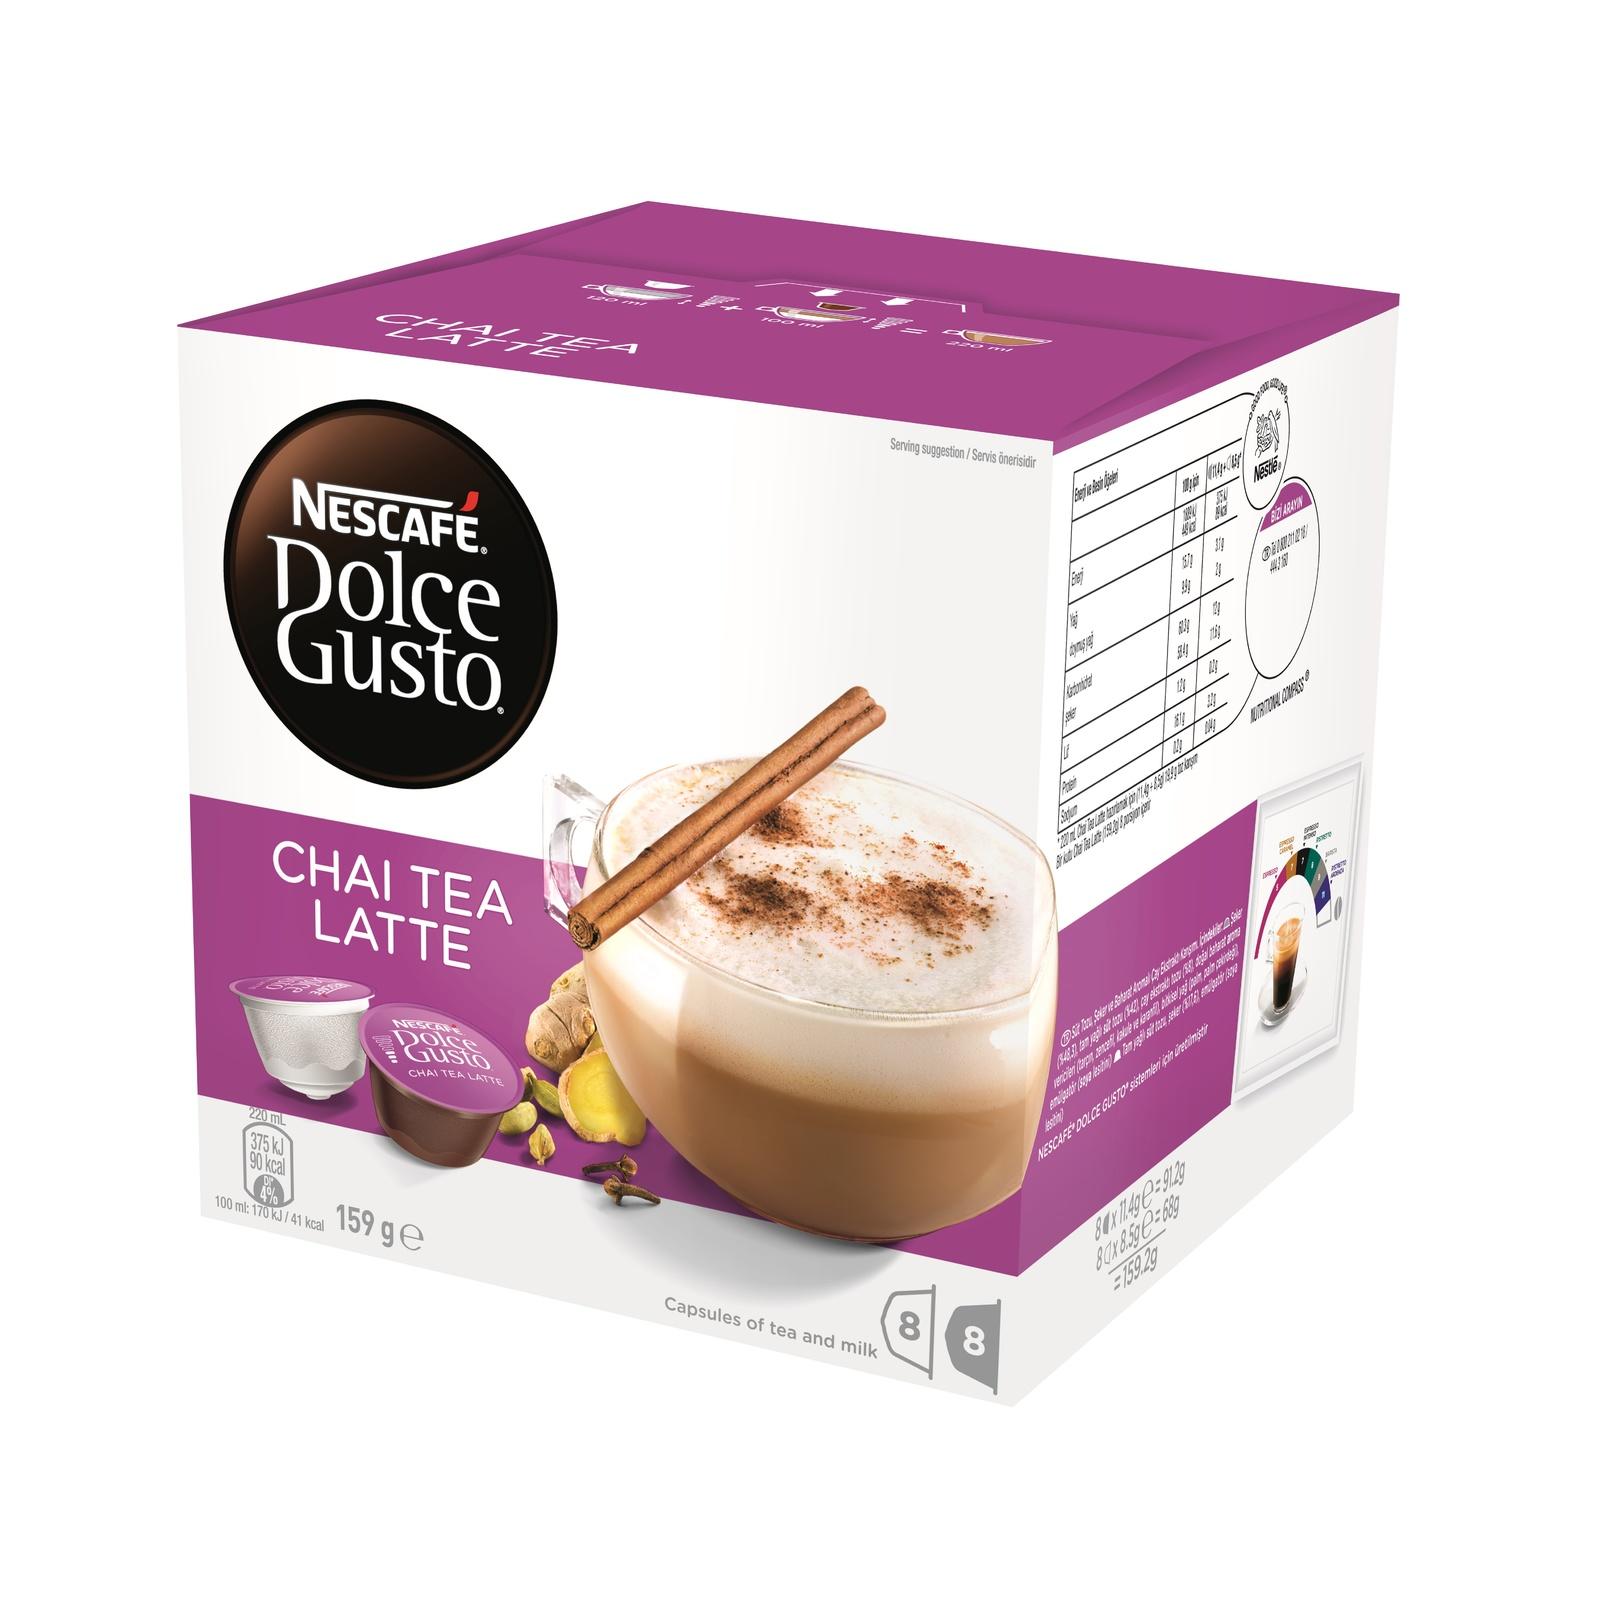 Nescafe Dolce Gusto (Chai Tea, 8pk) image